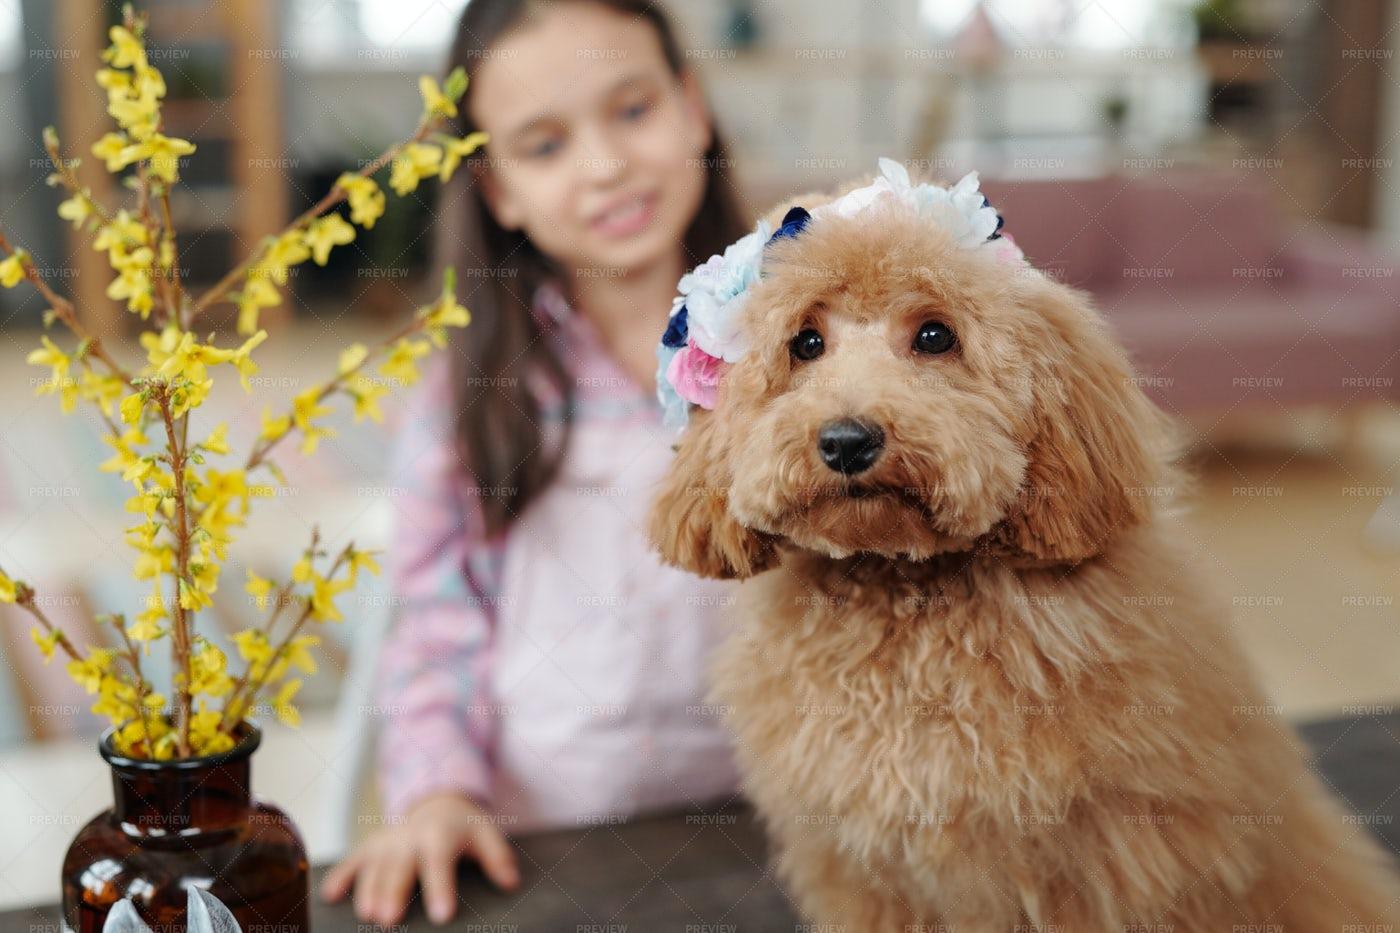 Cute Dog At Home: Stock Photos